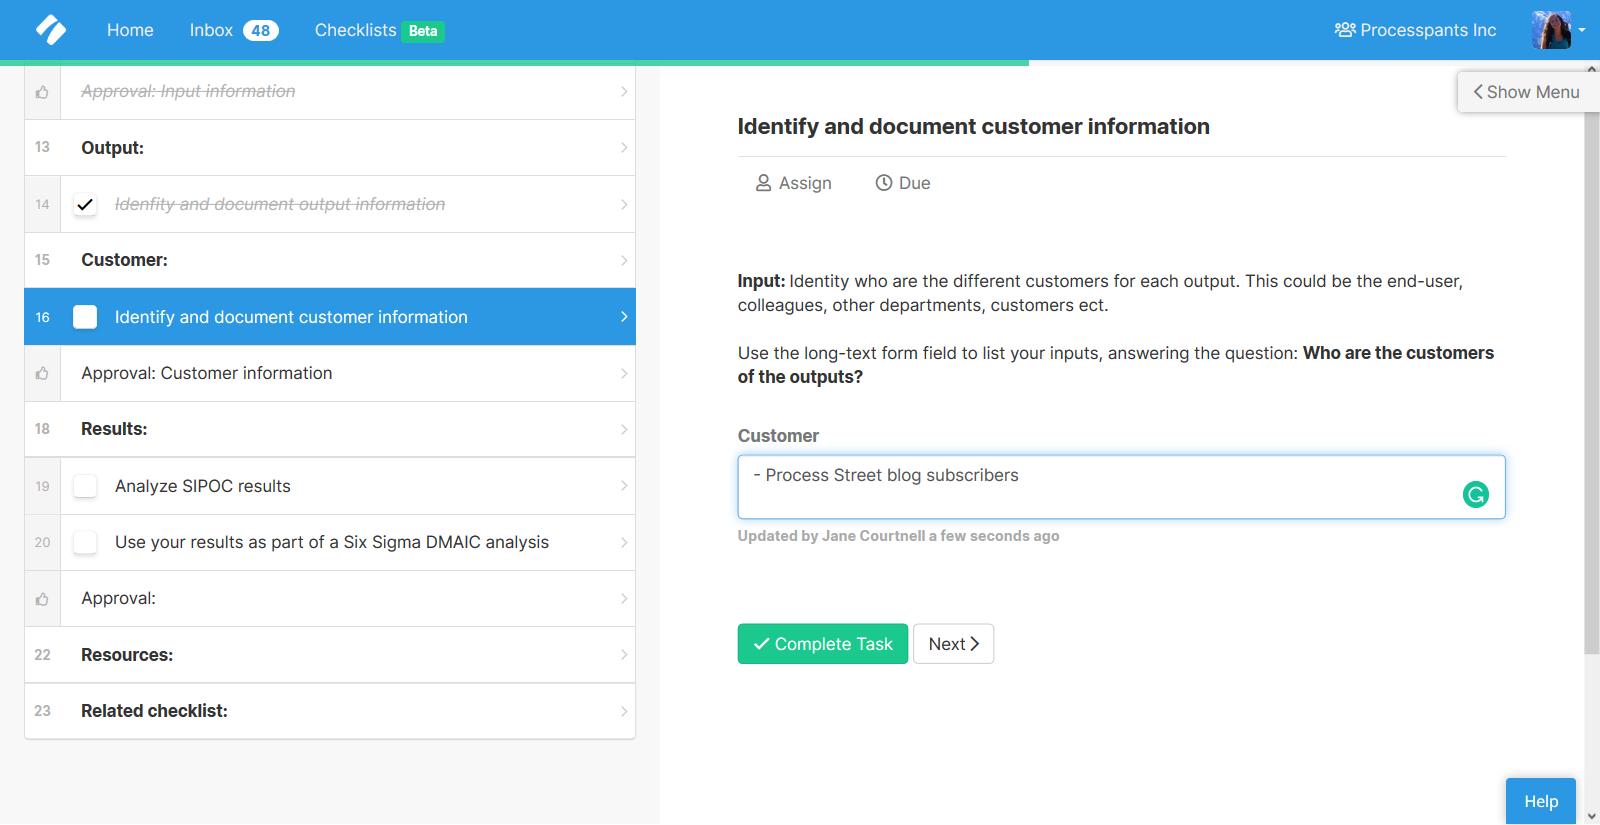 SIPOC - Customer information